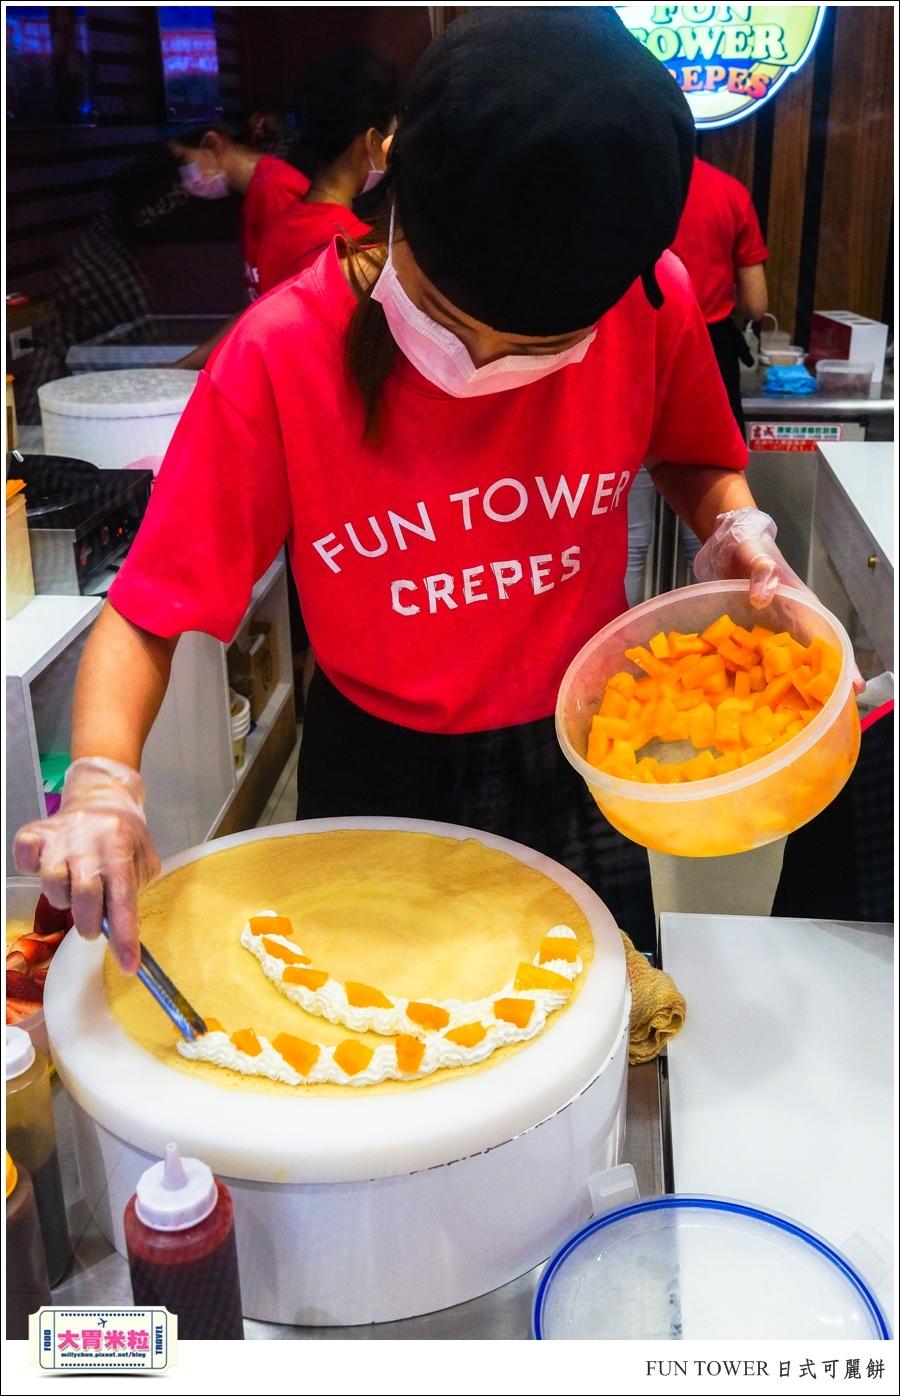 FUN TOWER日式可麗餅(高雄明華店)@高雄可麗餅甜點推薦@大胃米粒0023.jpg